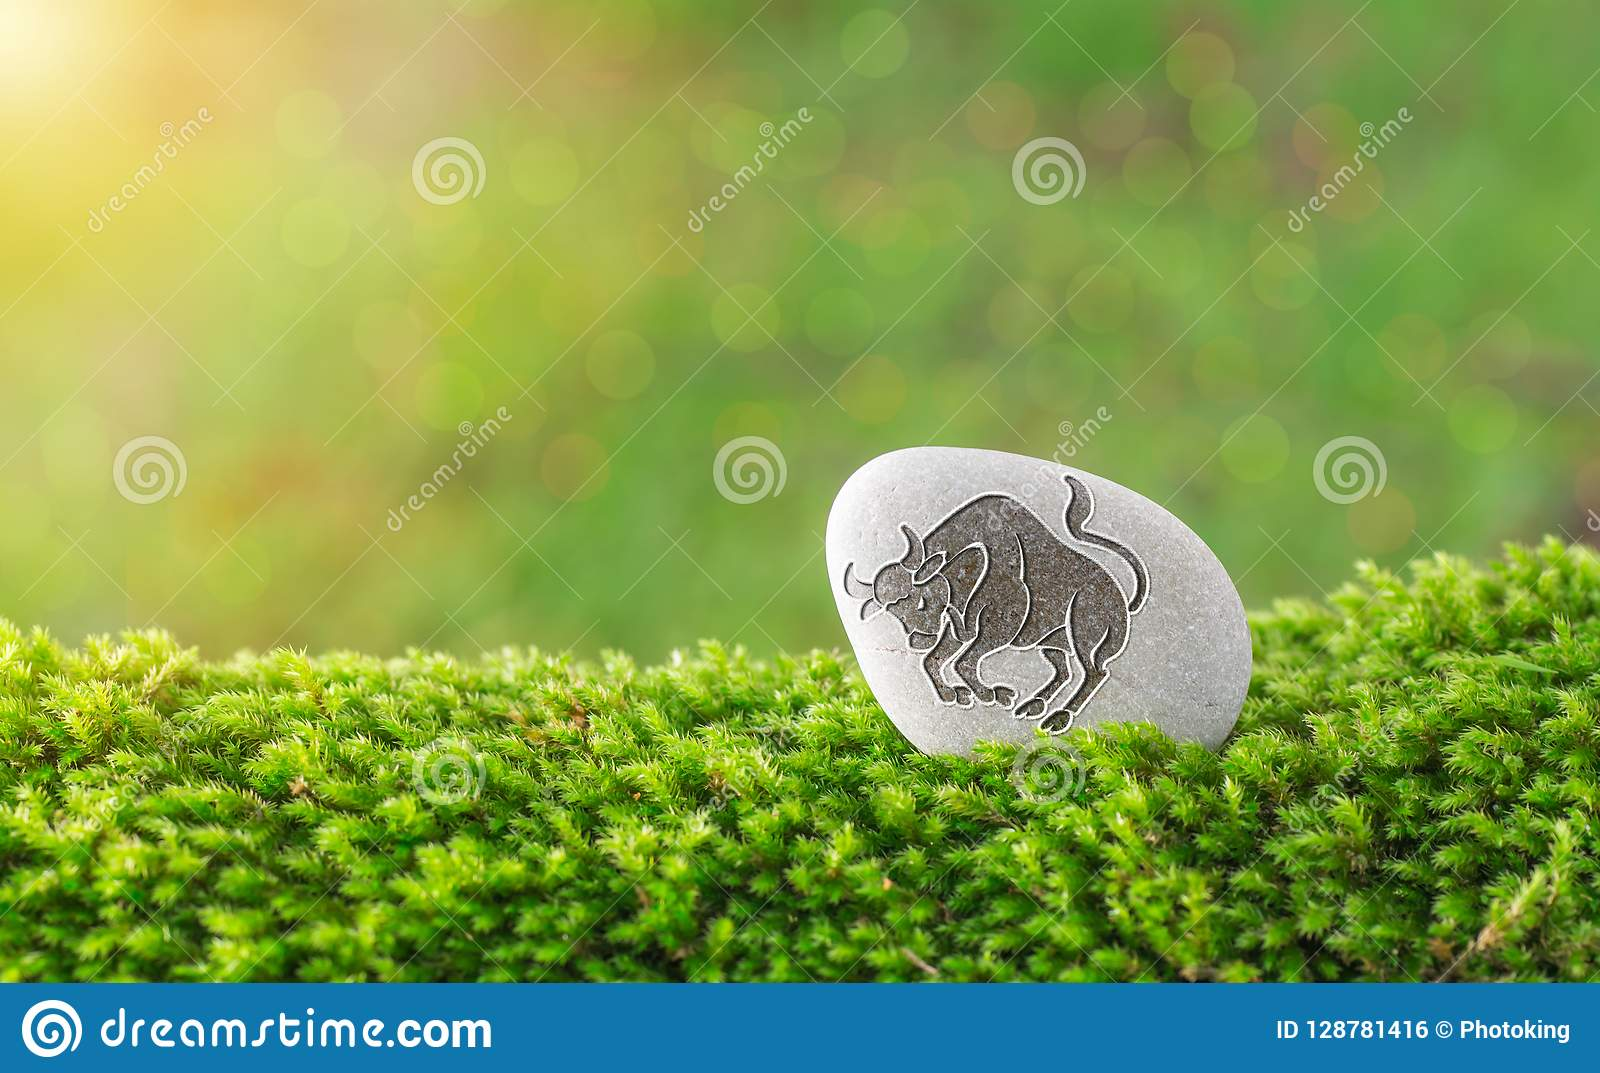 Taurus zodiac symbol in stone